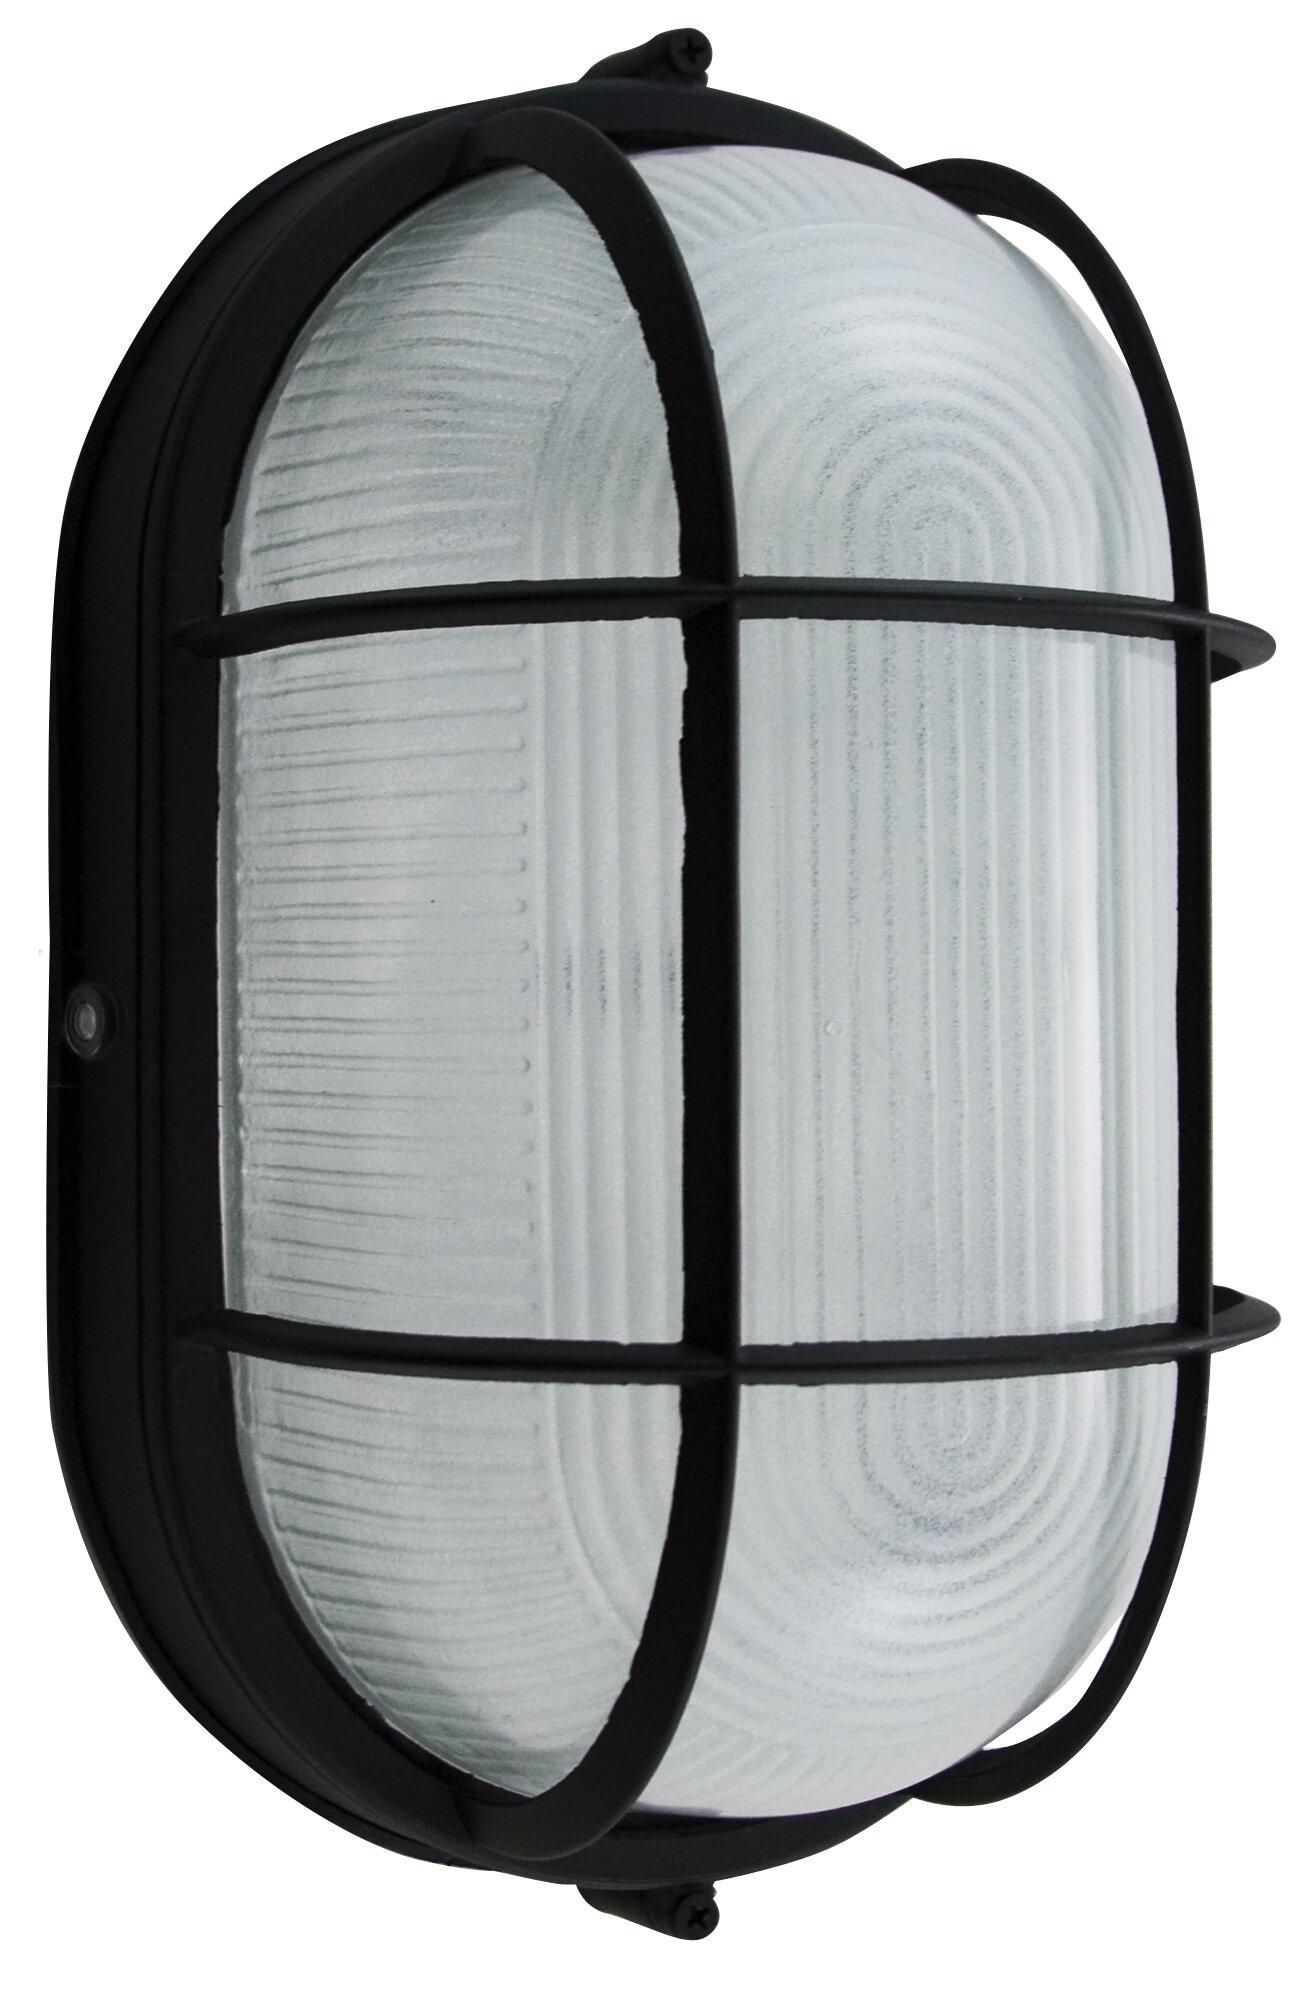 Outdoor Bulkhead Light